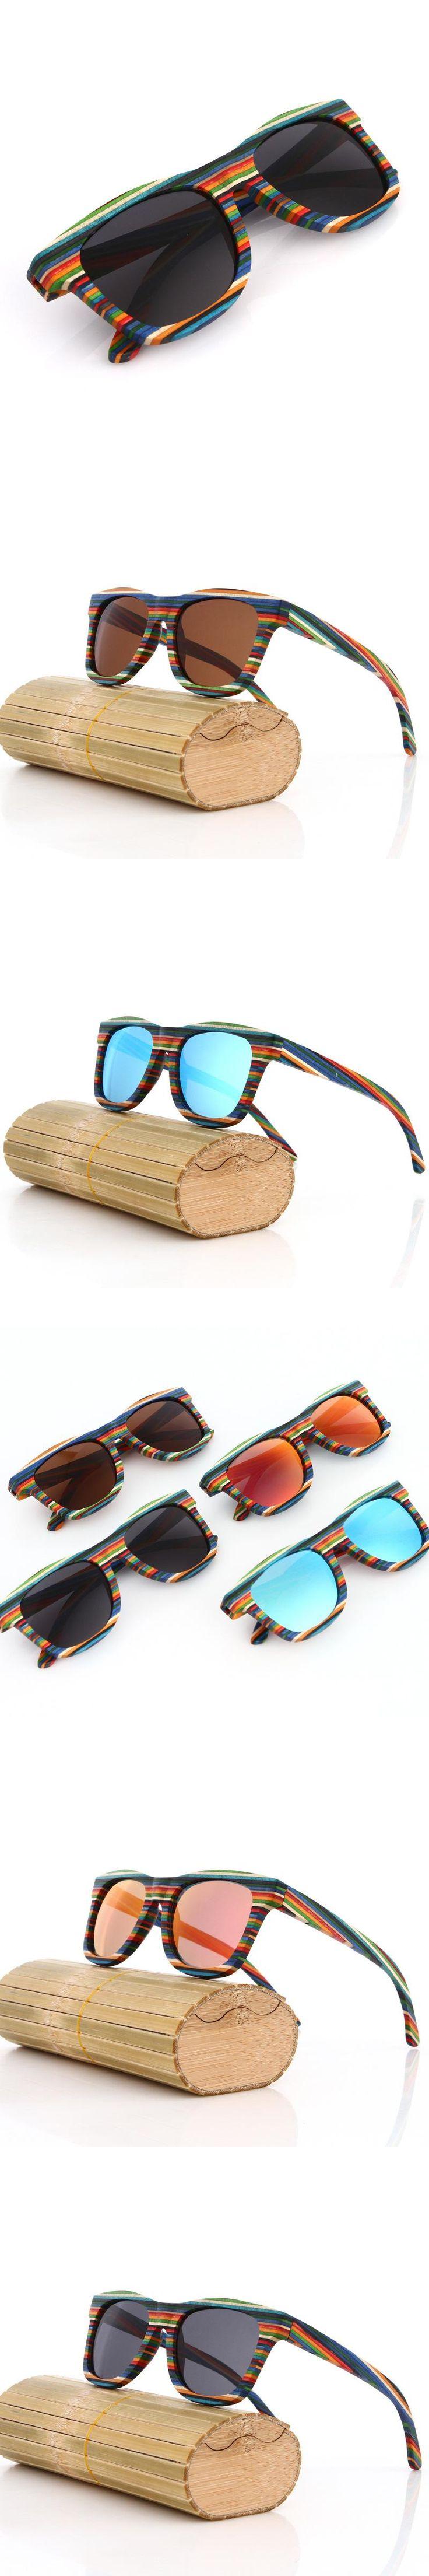 Hot Sale Unisex Vintage Design Handmade Skateboard Wooden Sunglasses Men Polarized